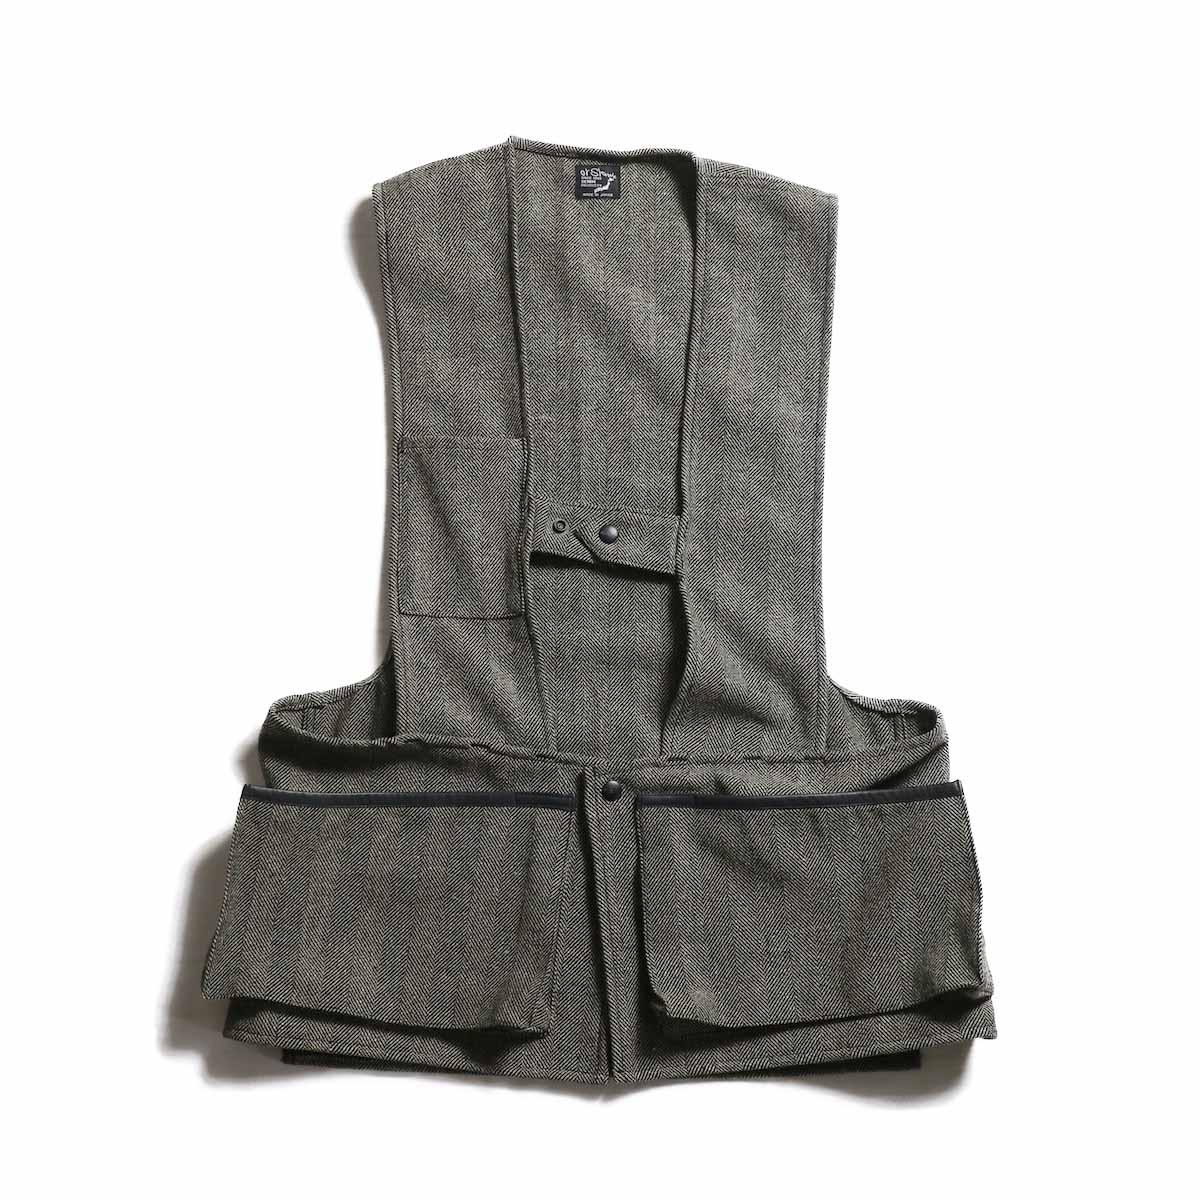 orSlow / Hunting Vest -Melton Wool Herringbone Twill(GRAY)